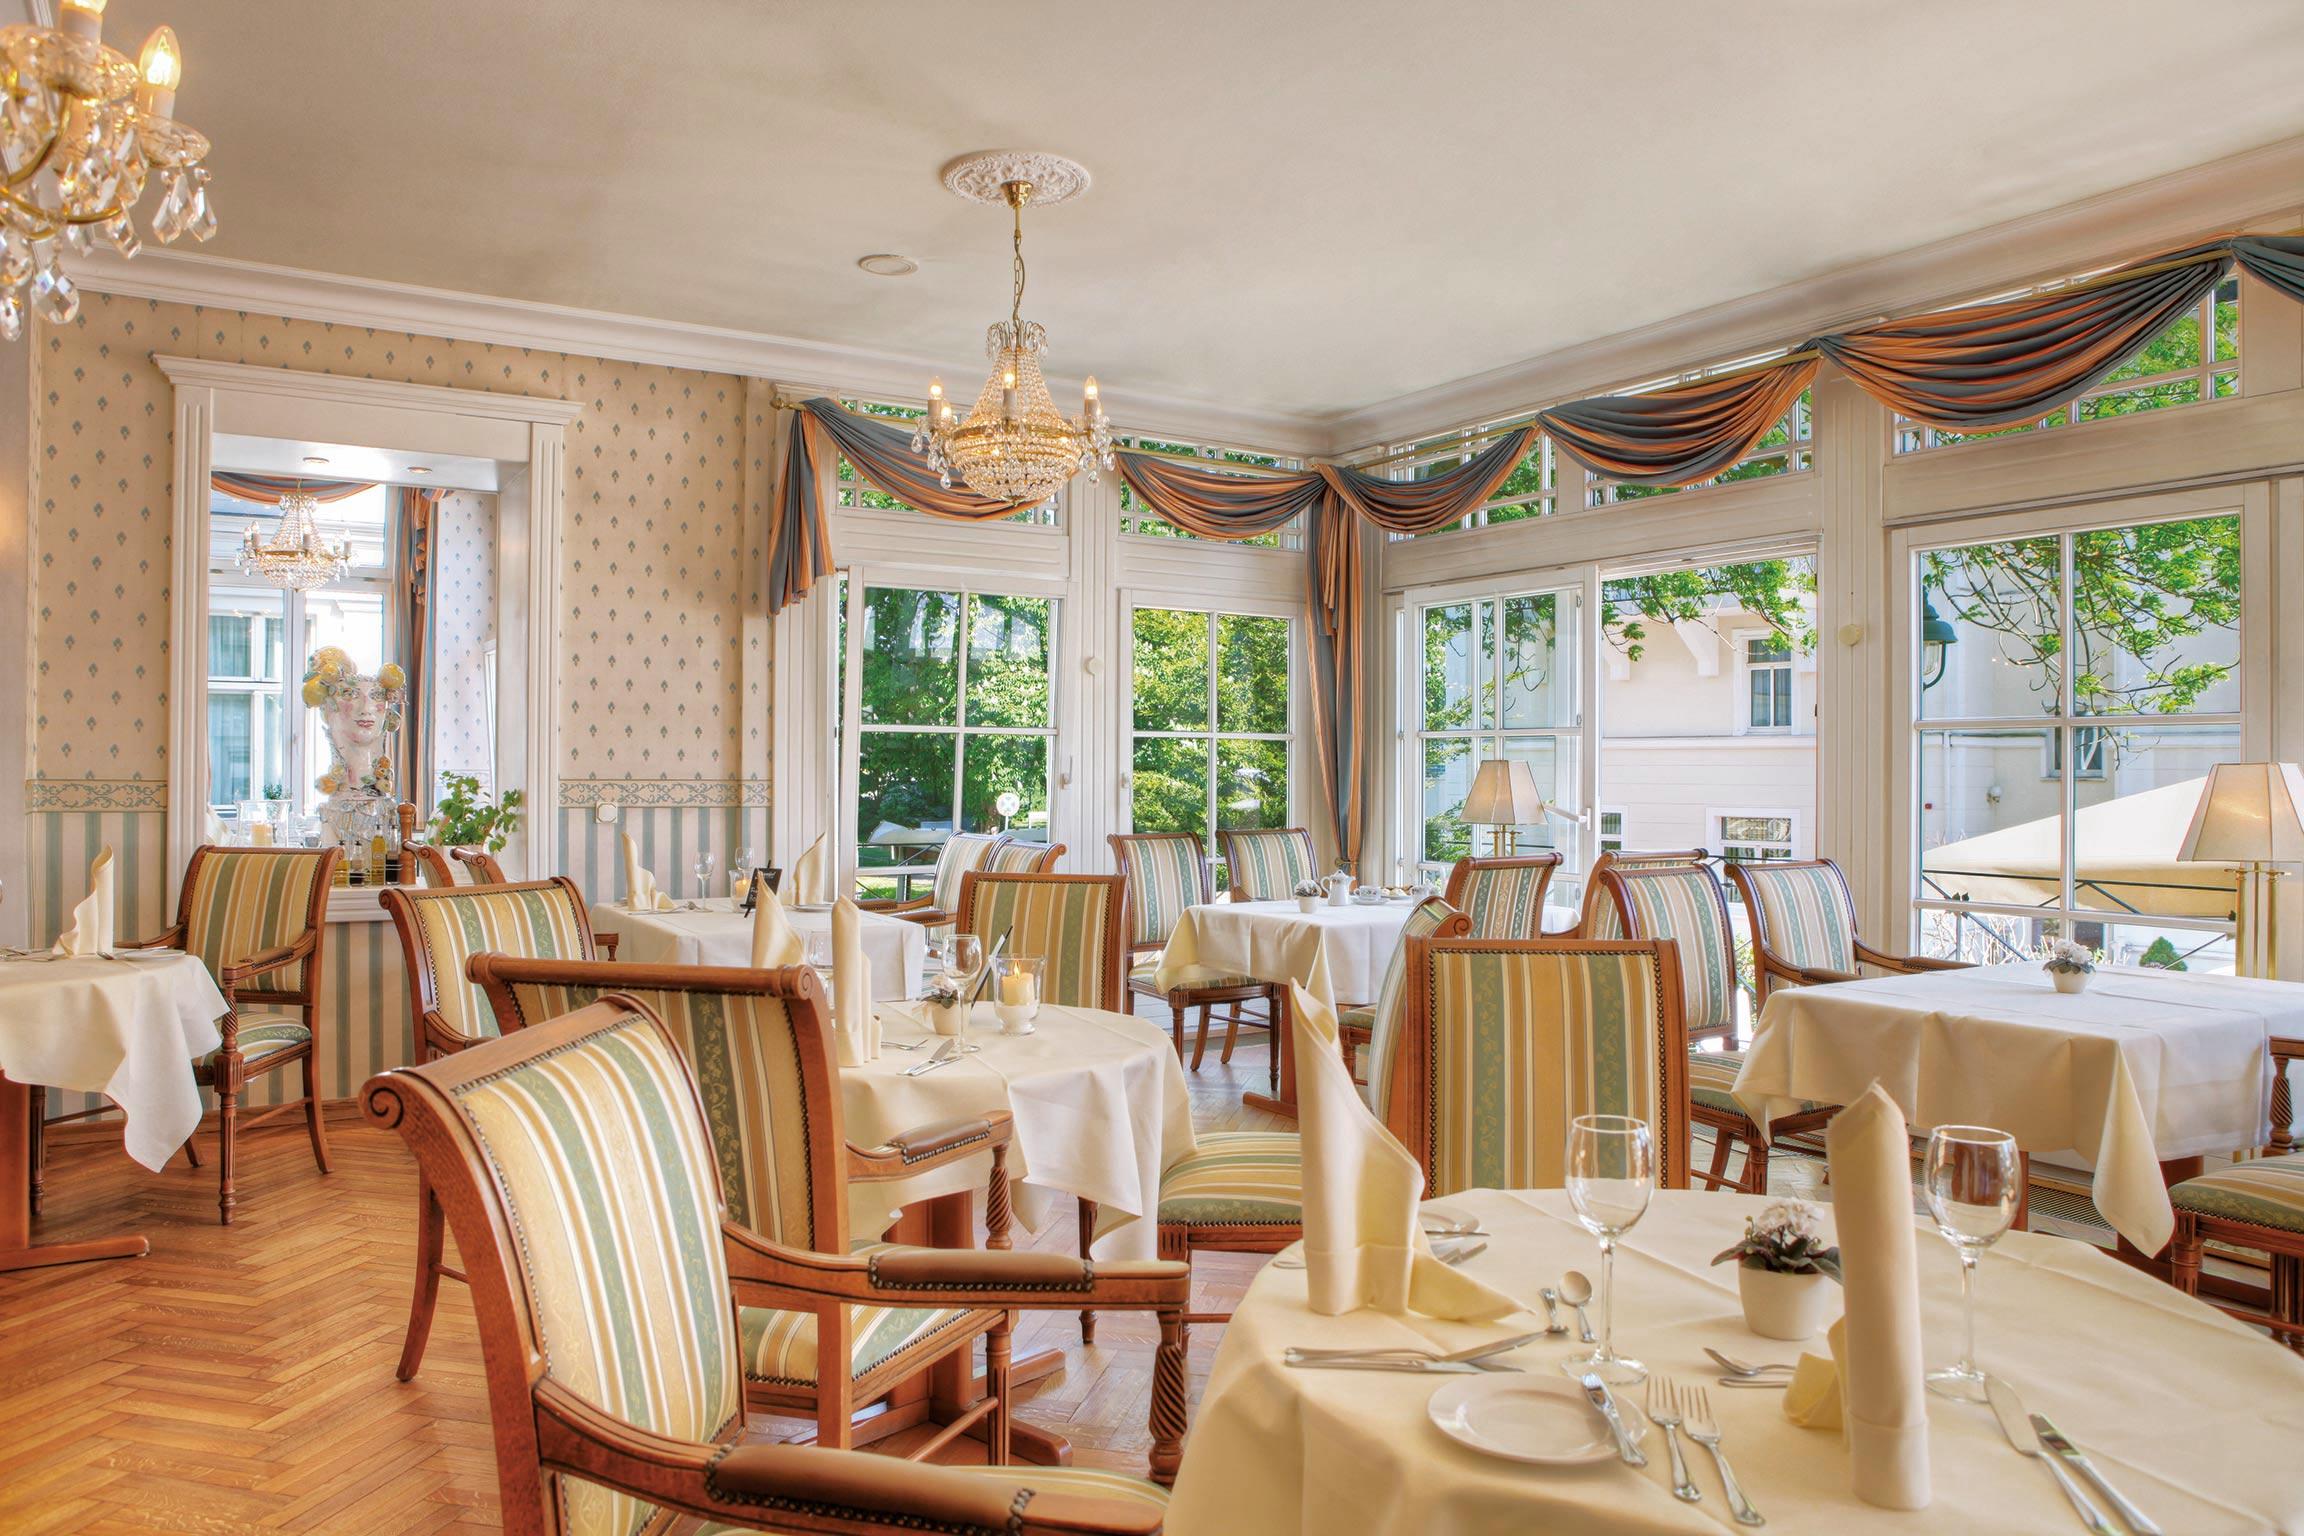 SEETELHOTEL Romantik Hotel Esplanade